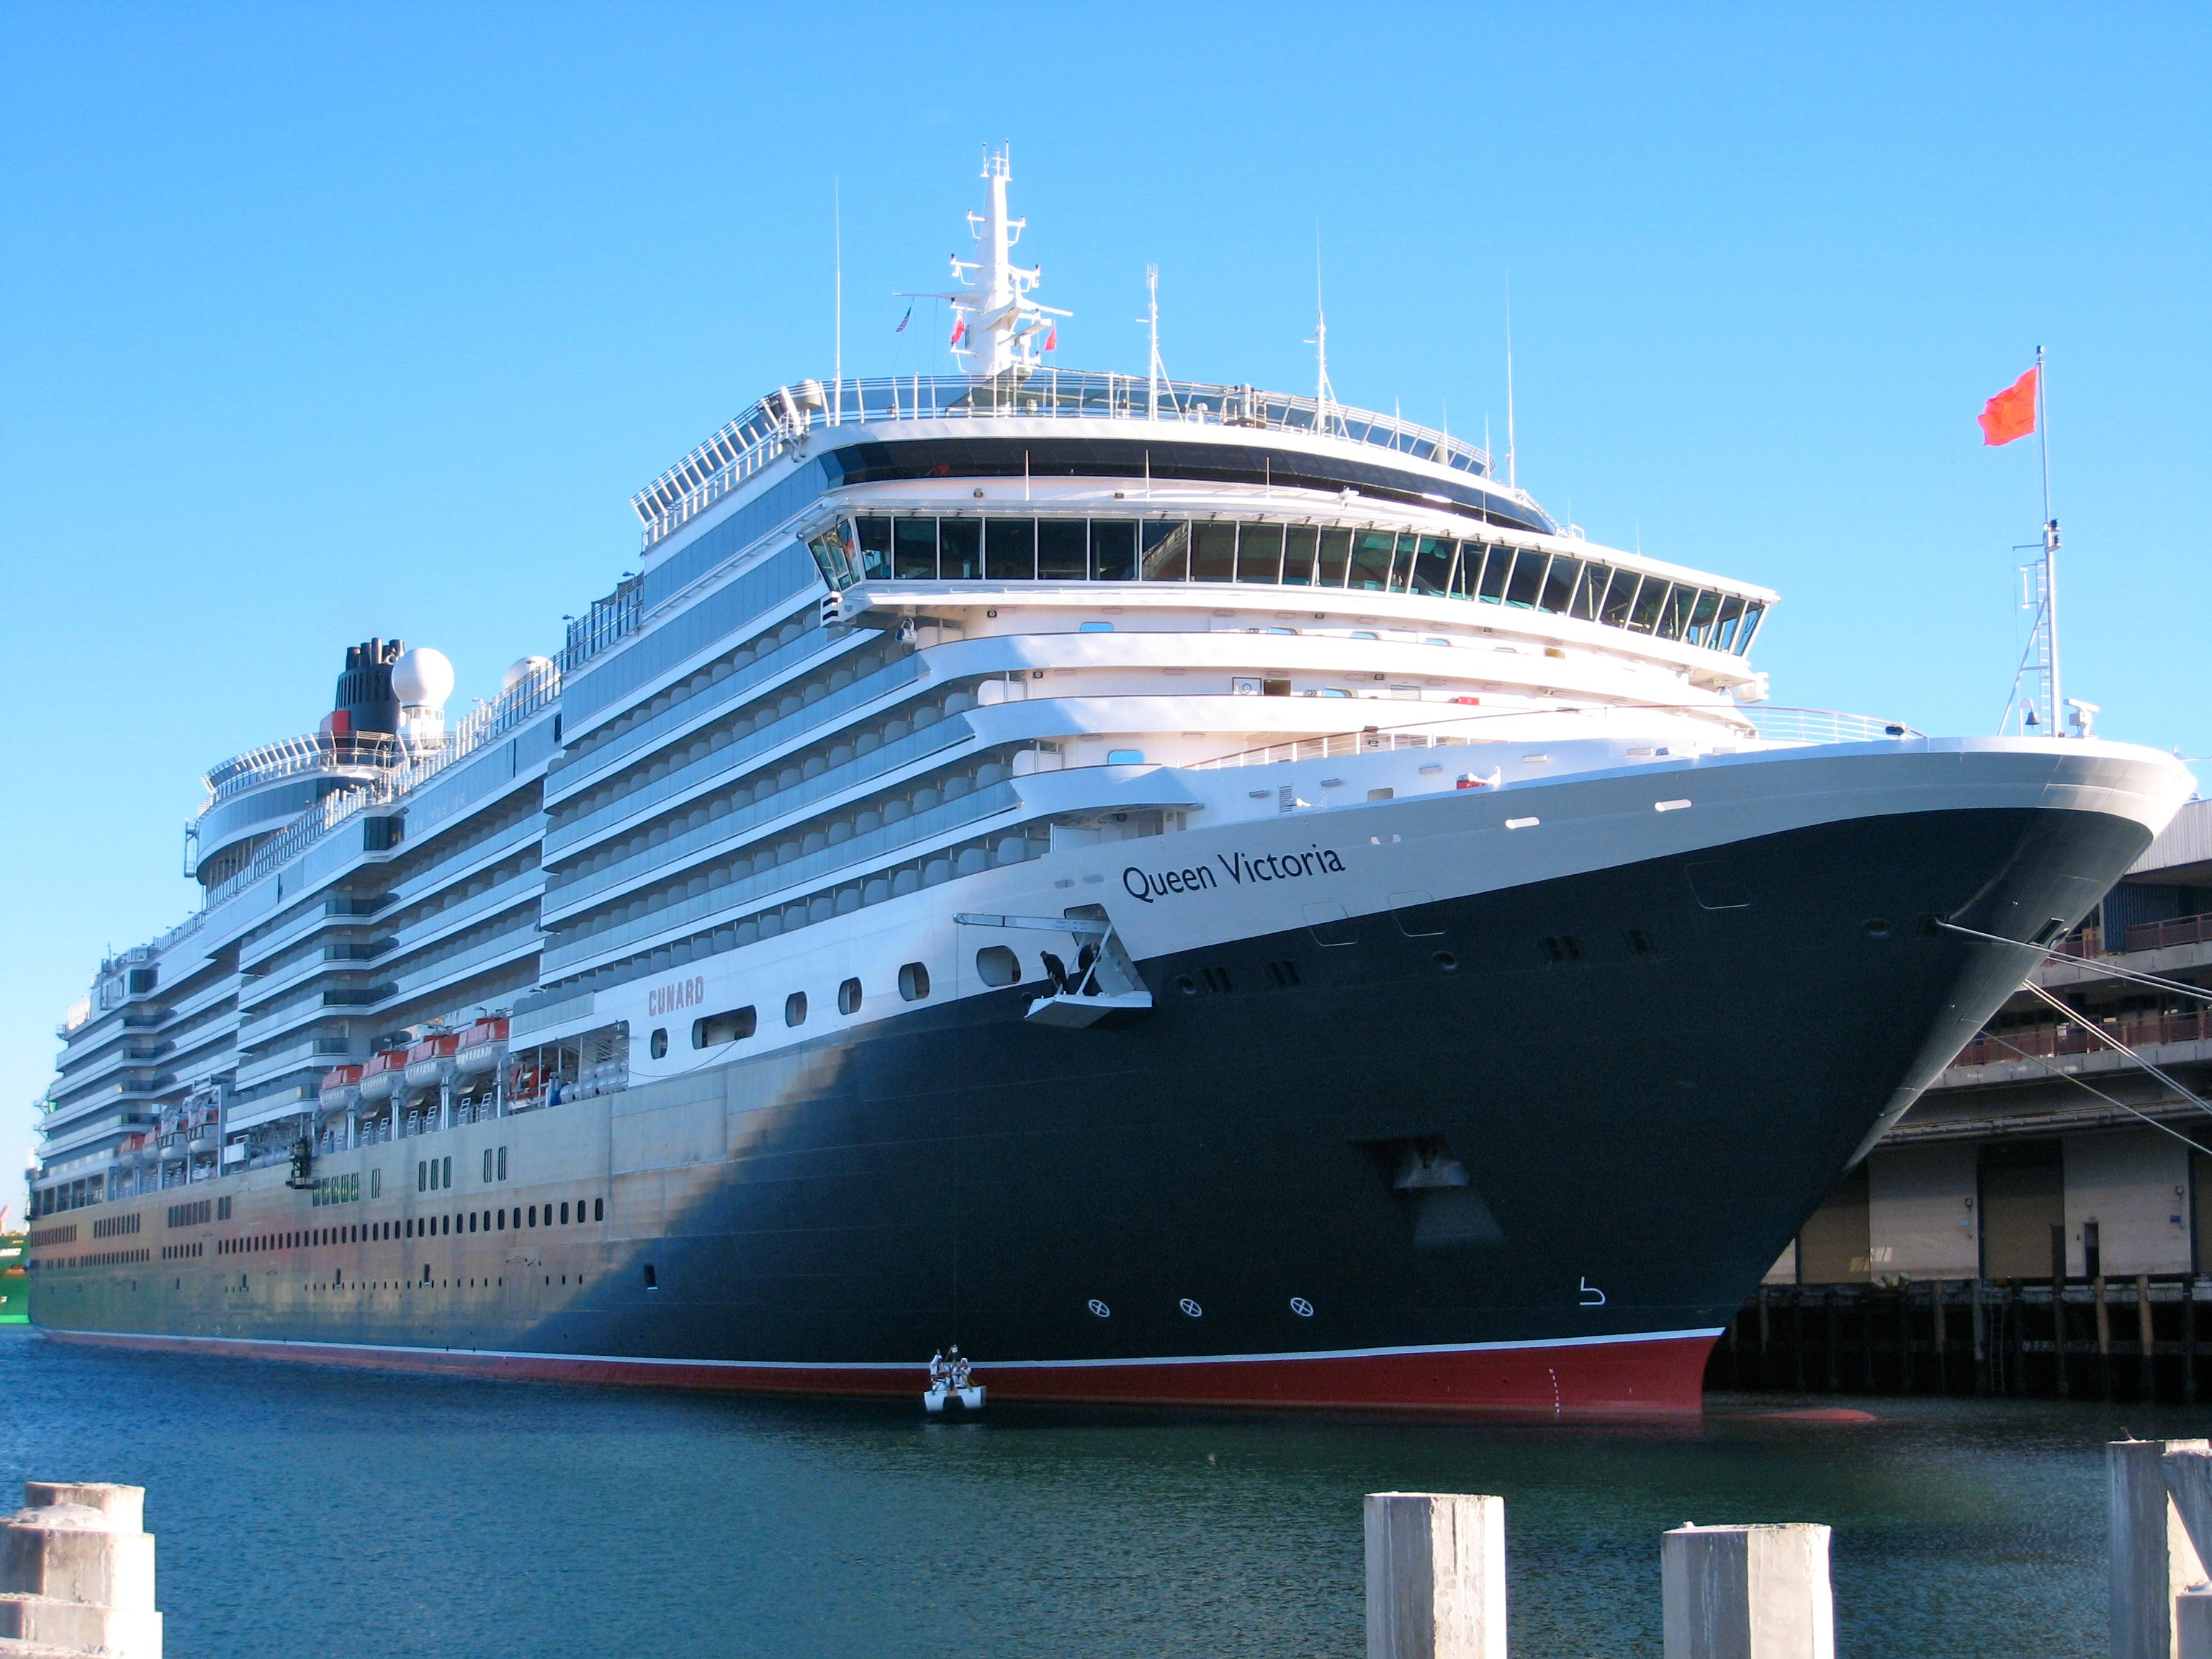 Cunardu0027s Queen Victoria to get more cabins